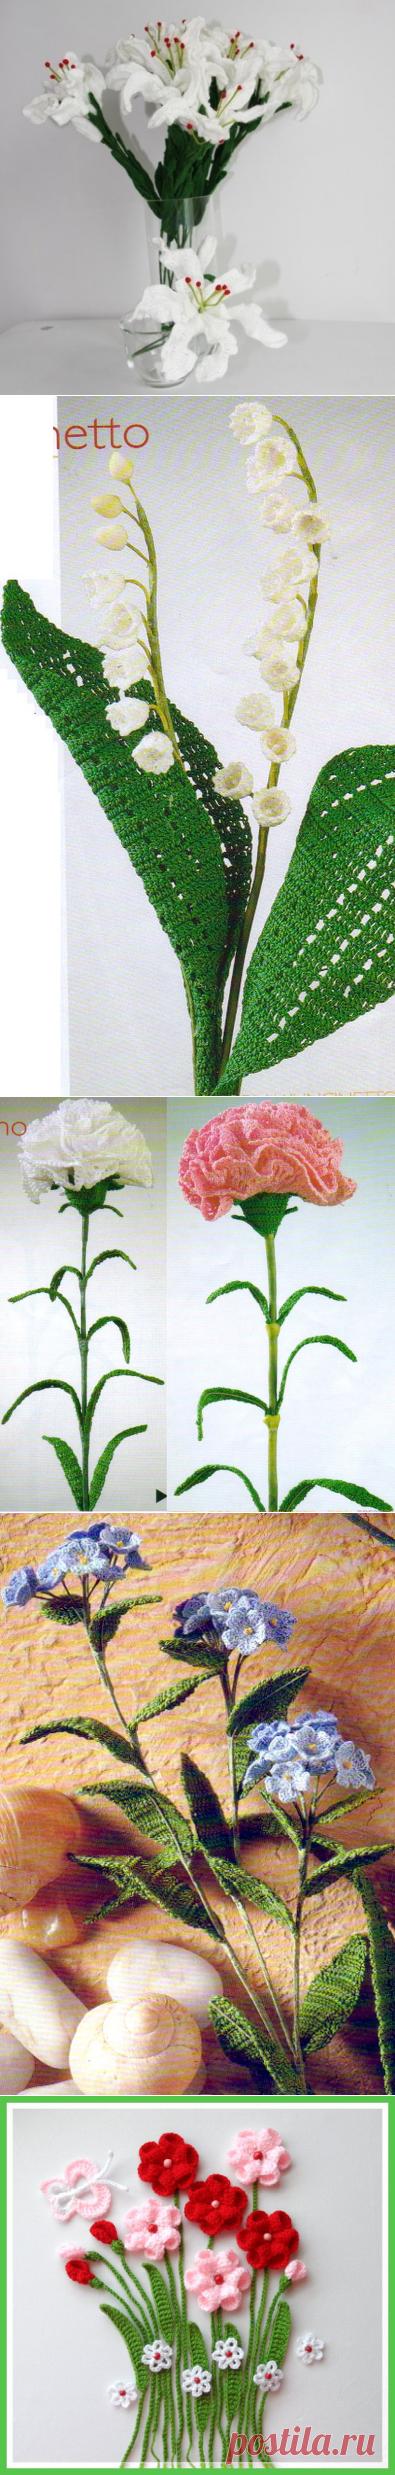 Нежные цветы, связанные крючком